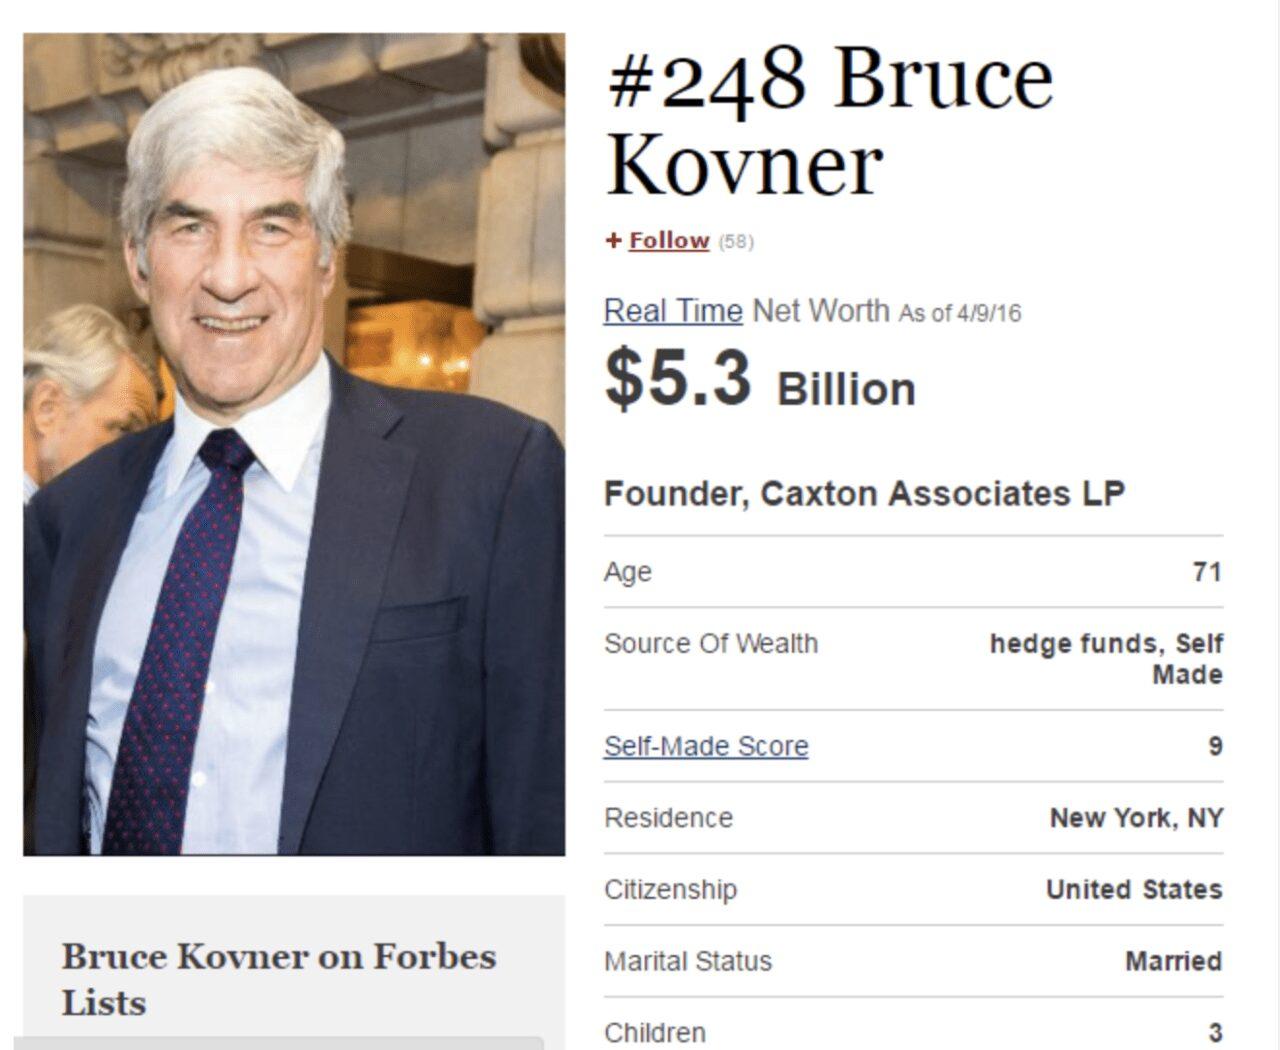 Bruce Kovner de taxista a millonario trader millonario forex bruce kovner bruce kovner trader